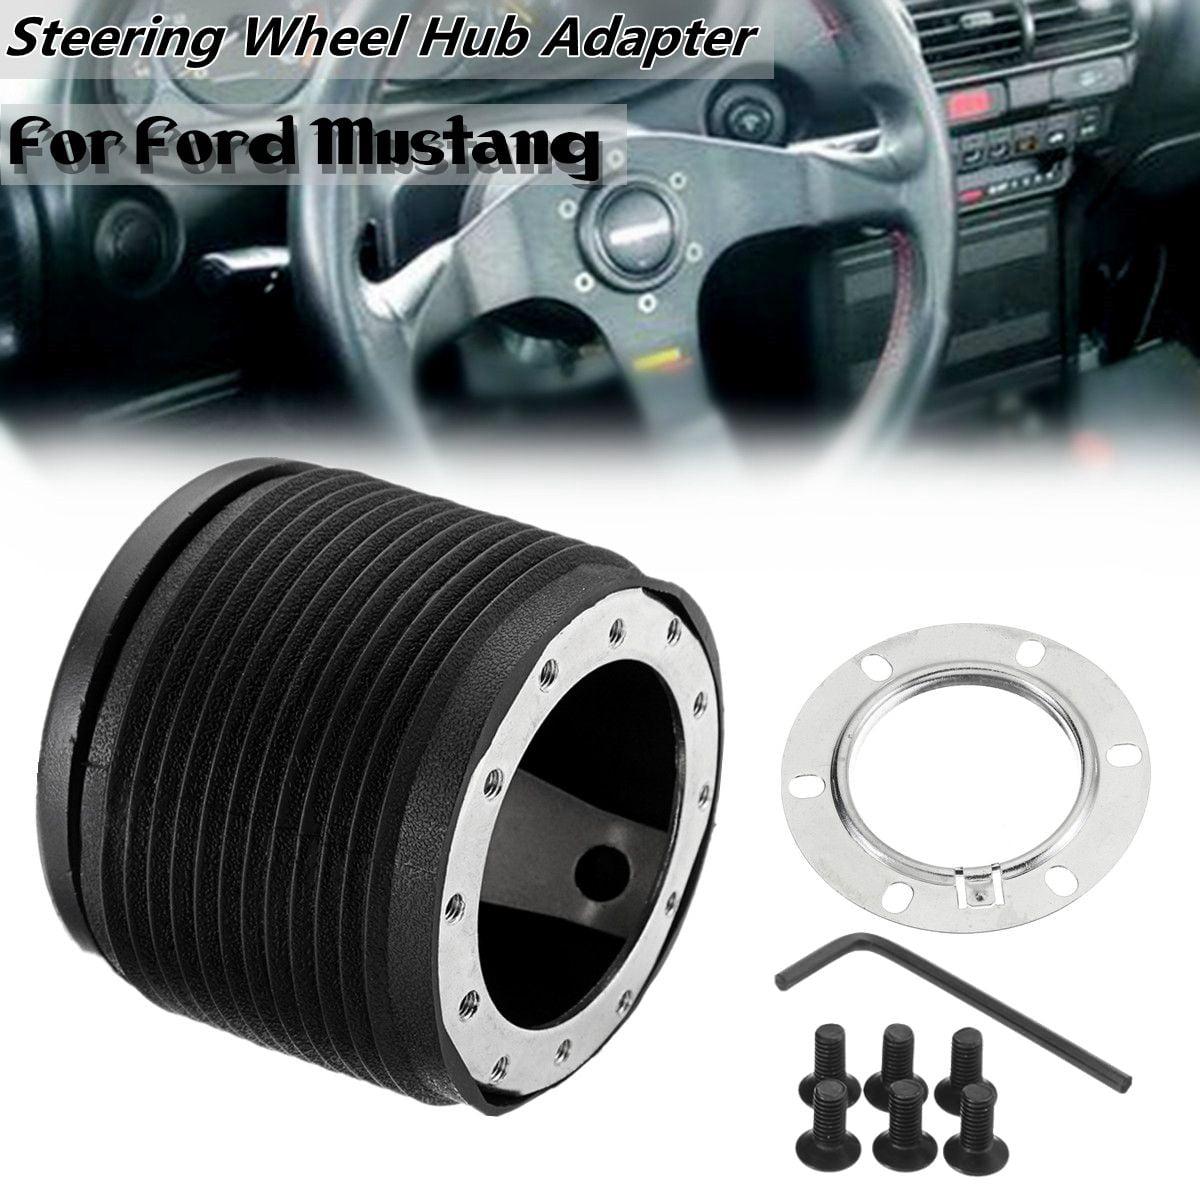 6 Bolt Hole Racing Steering Wheel Hub Adapter Boss Kit For Ford Mustang 89 95 Us Walmart Canada